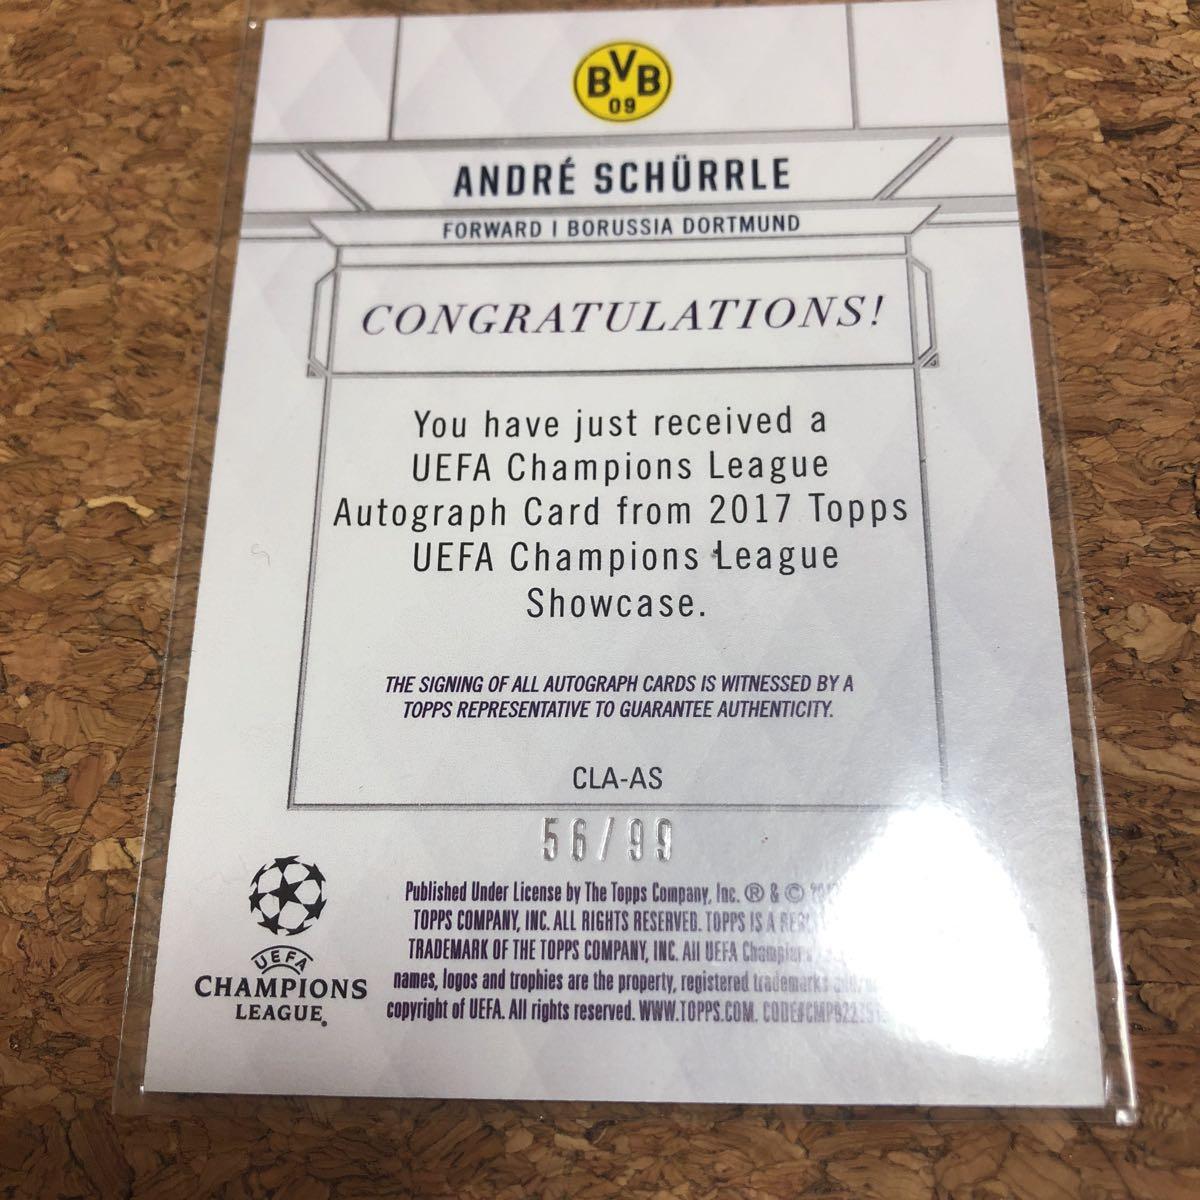 topps UEFA チャンピオンリーグ ドイツ代表 ドルトムント シュールレ 99枚限定 オートグラフ 直筆サインカード_画像4